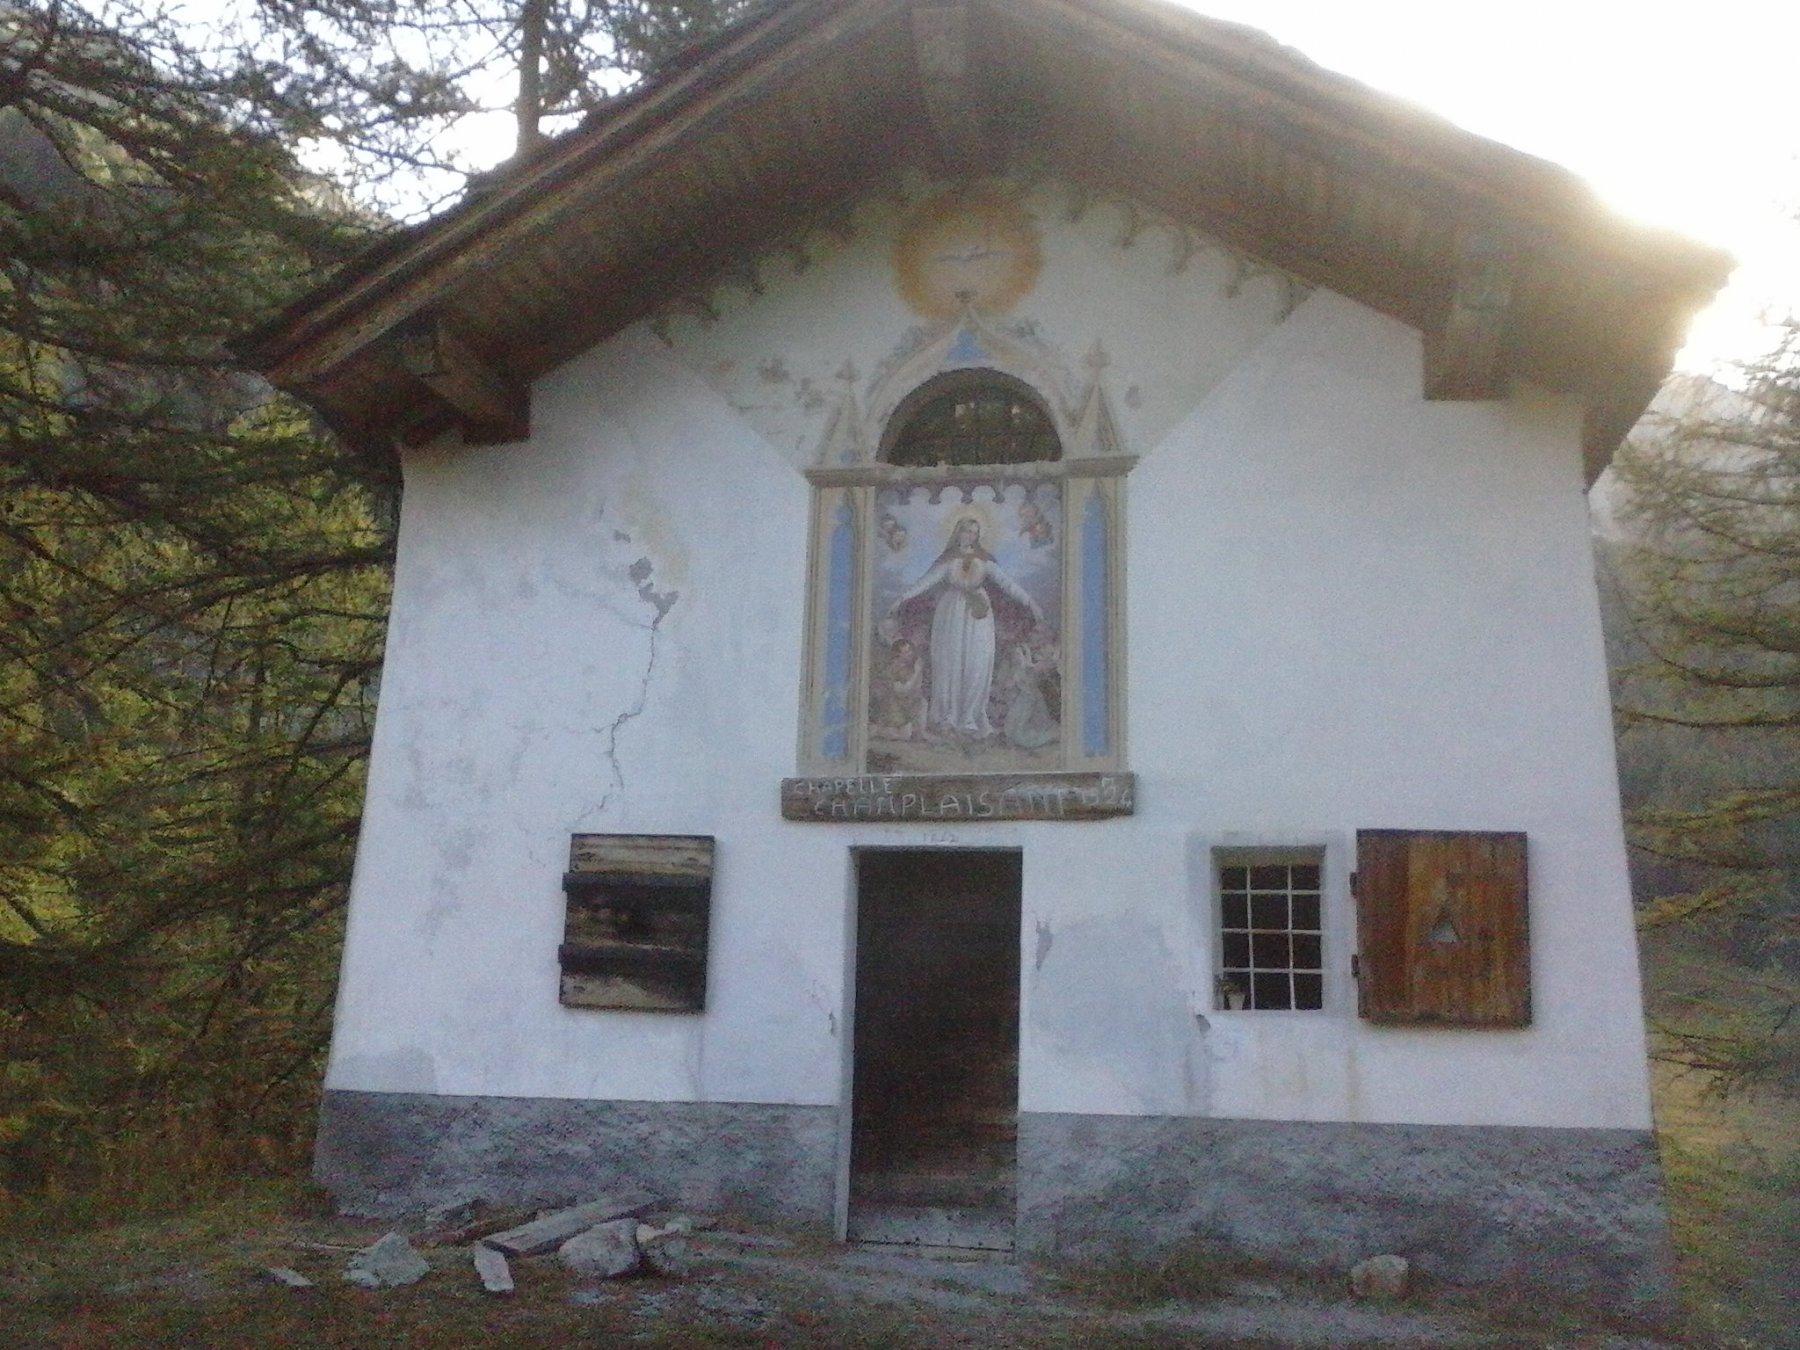 Larrivo al Santuario di Champlaisant...